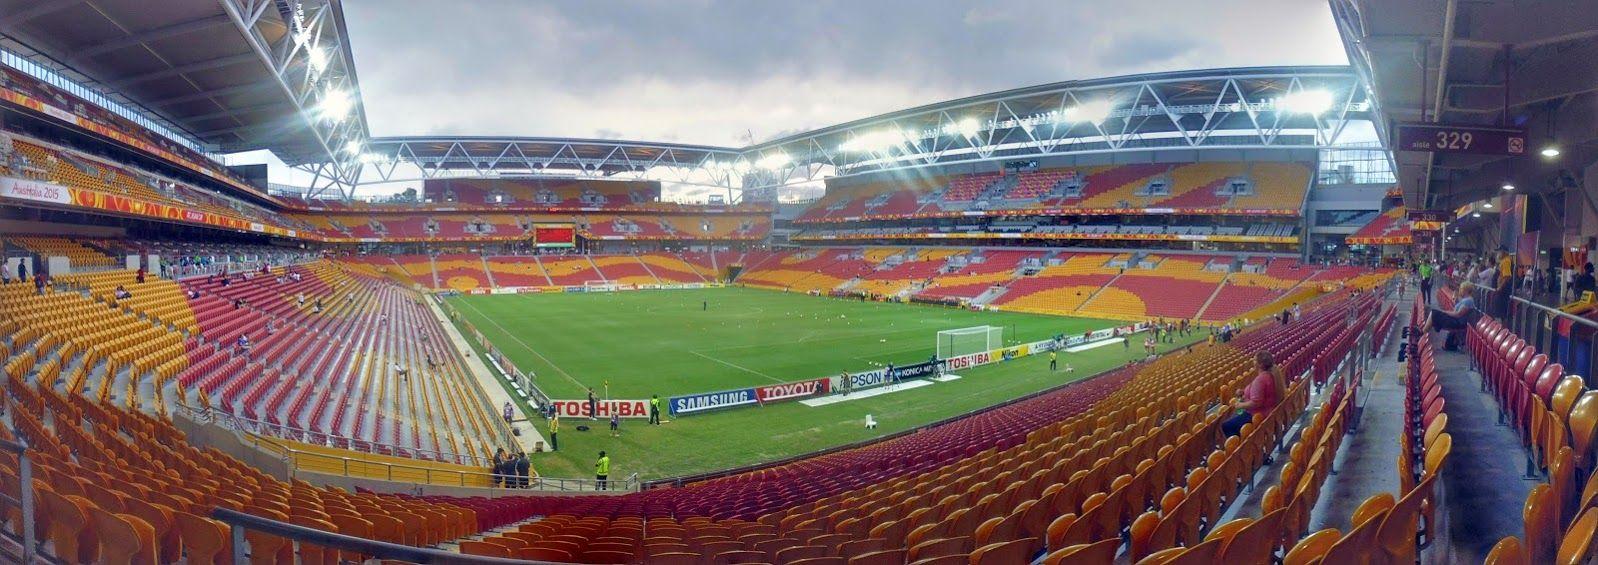 suncorp stadium - photo #37